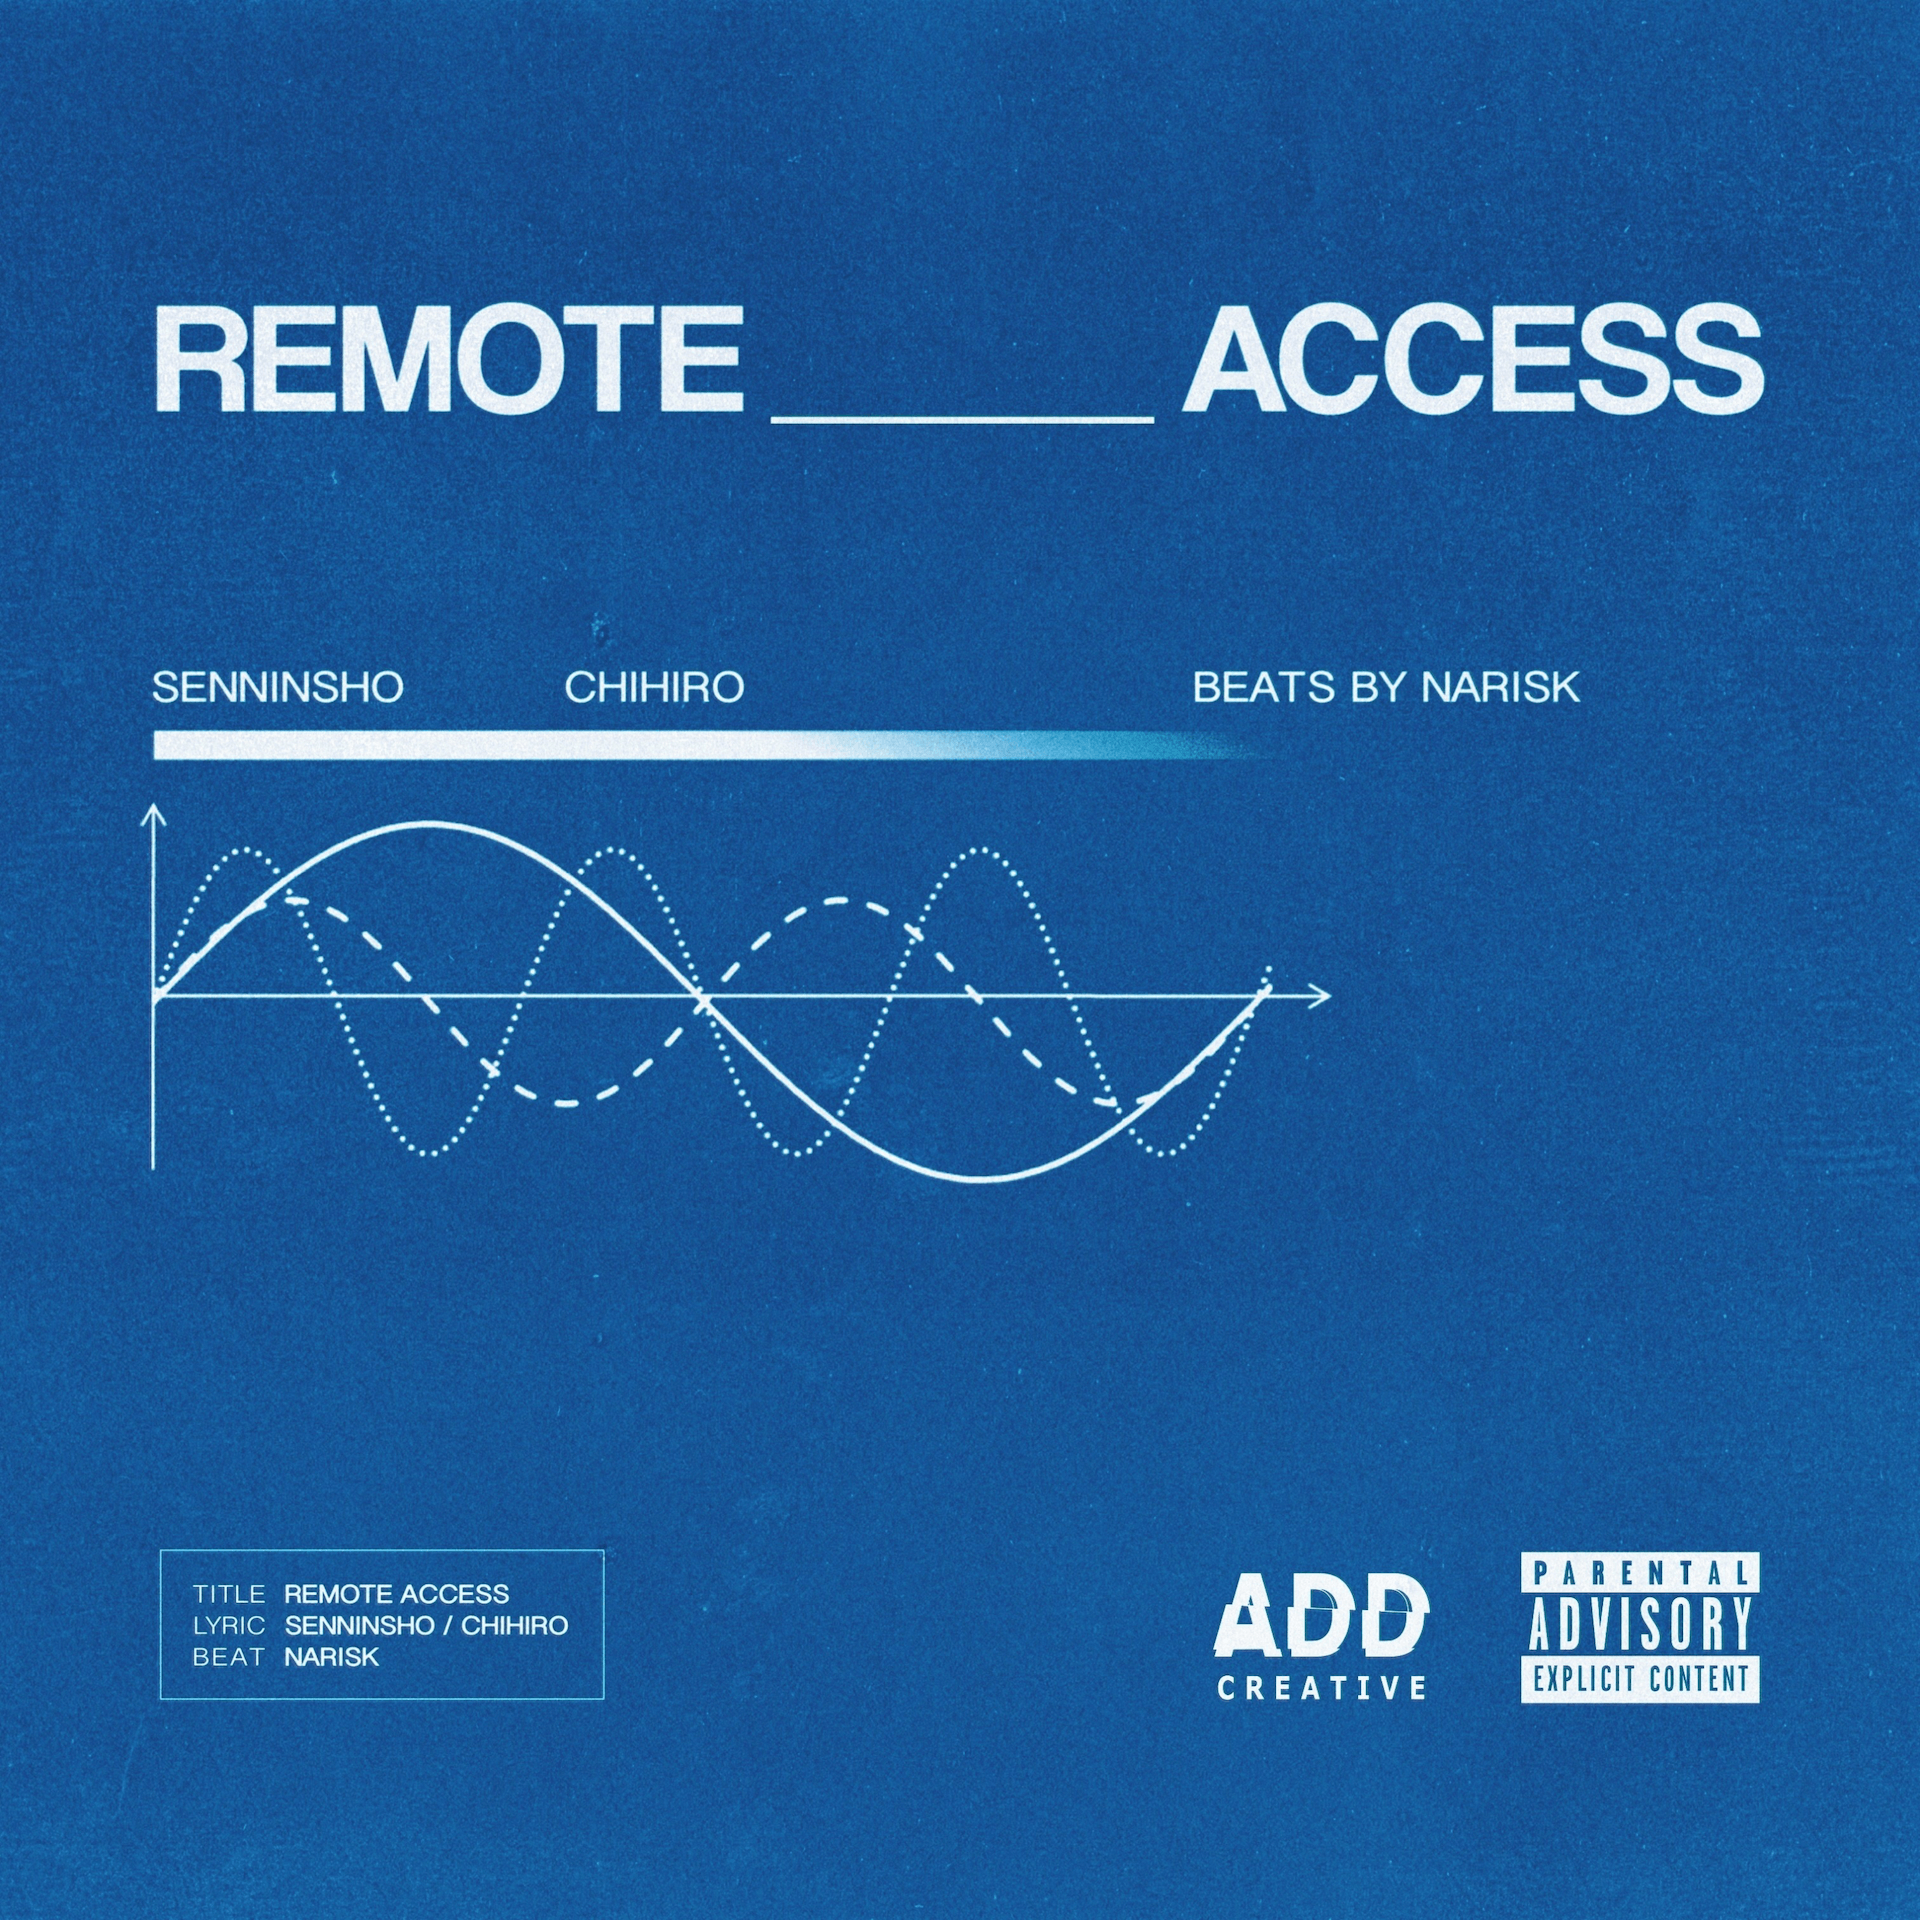 "ADD CREATIVEが仙人掌&智大とタッグを組んだ新曲""REMOTE ACCESS""をリリース!YouTubeにてオフィシャルオーディオも公開 music20201030-sennninsho_chihiro"